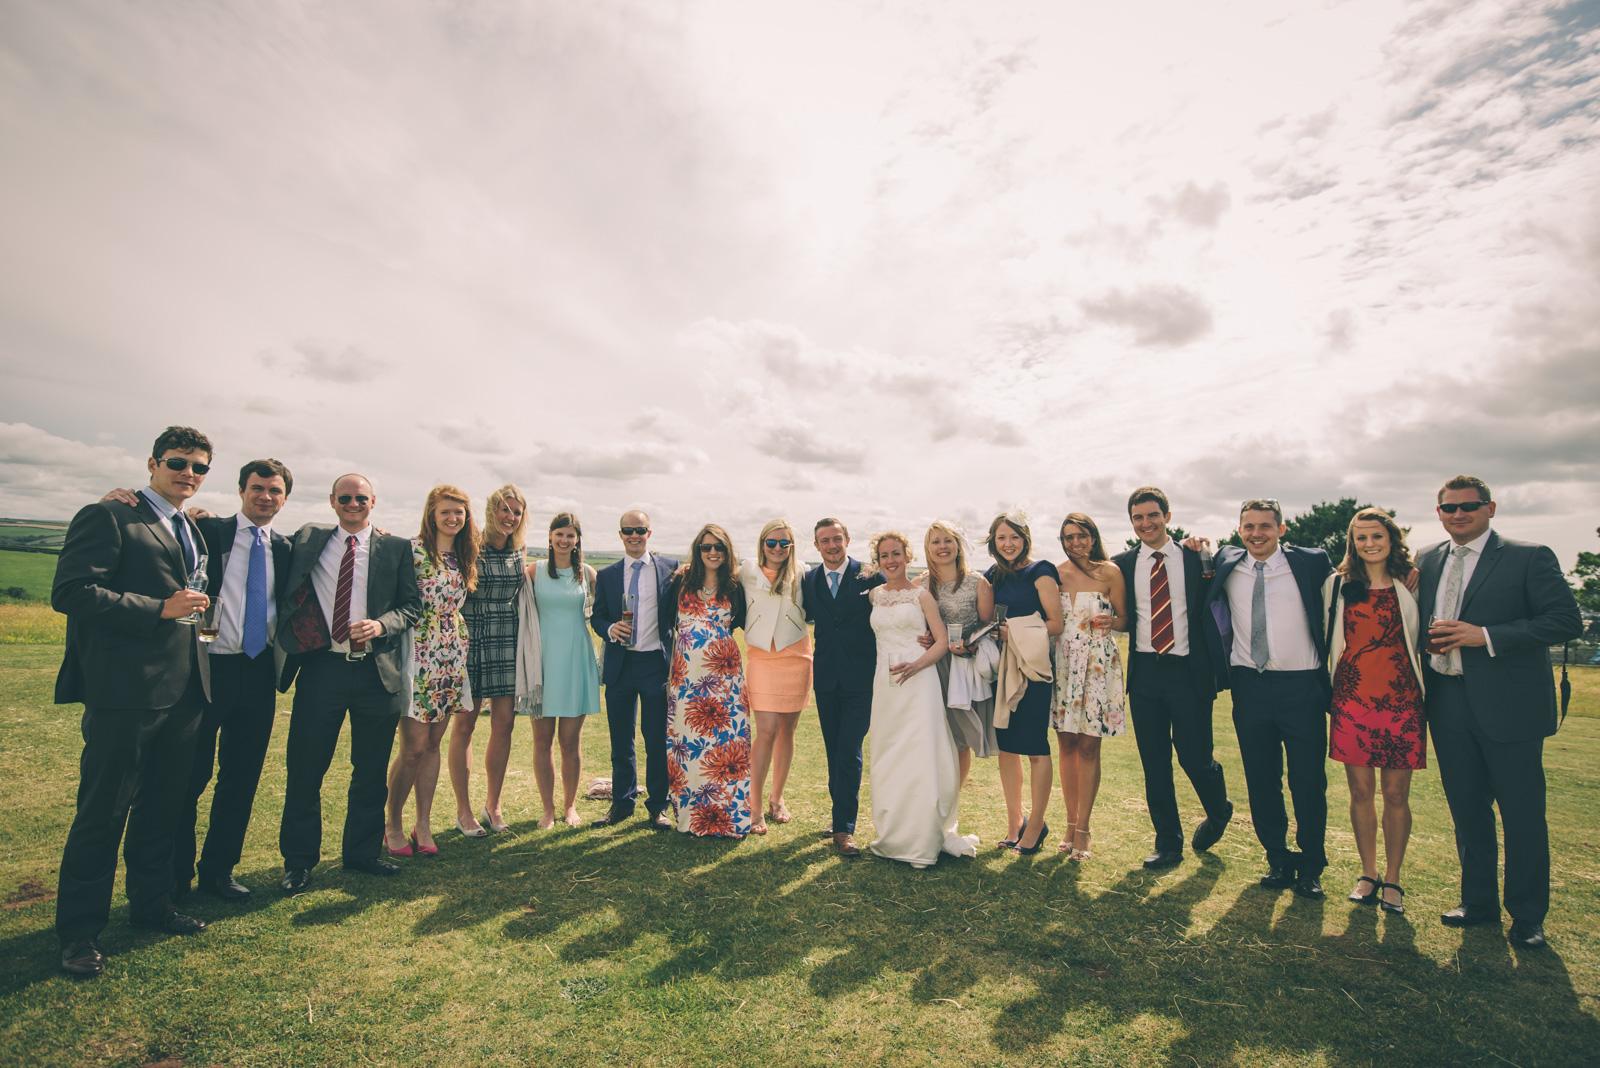 wedding-photography-rock-118.jpg